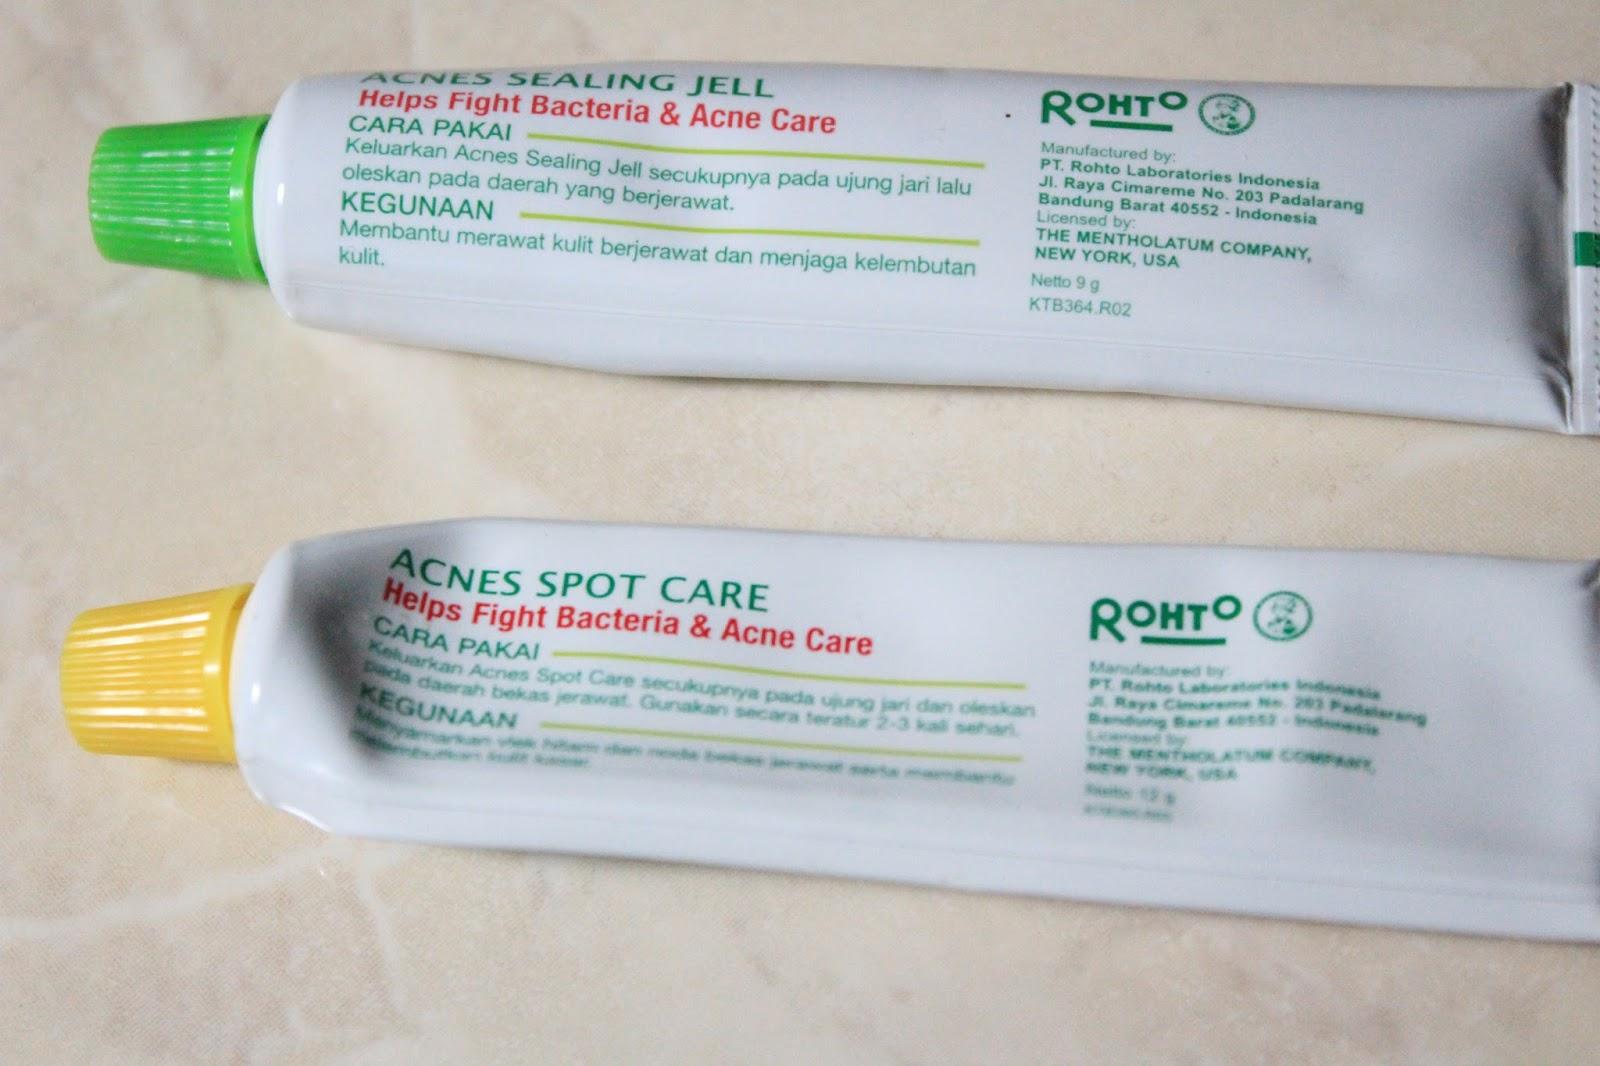 cara pakai mentholatum acnes sealing